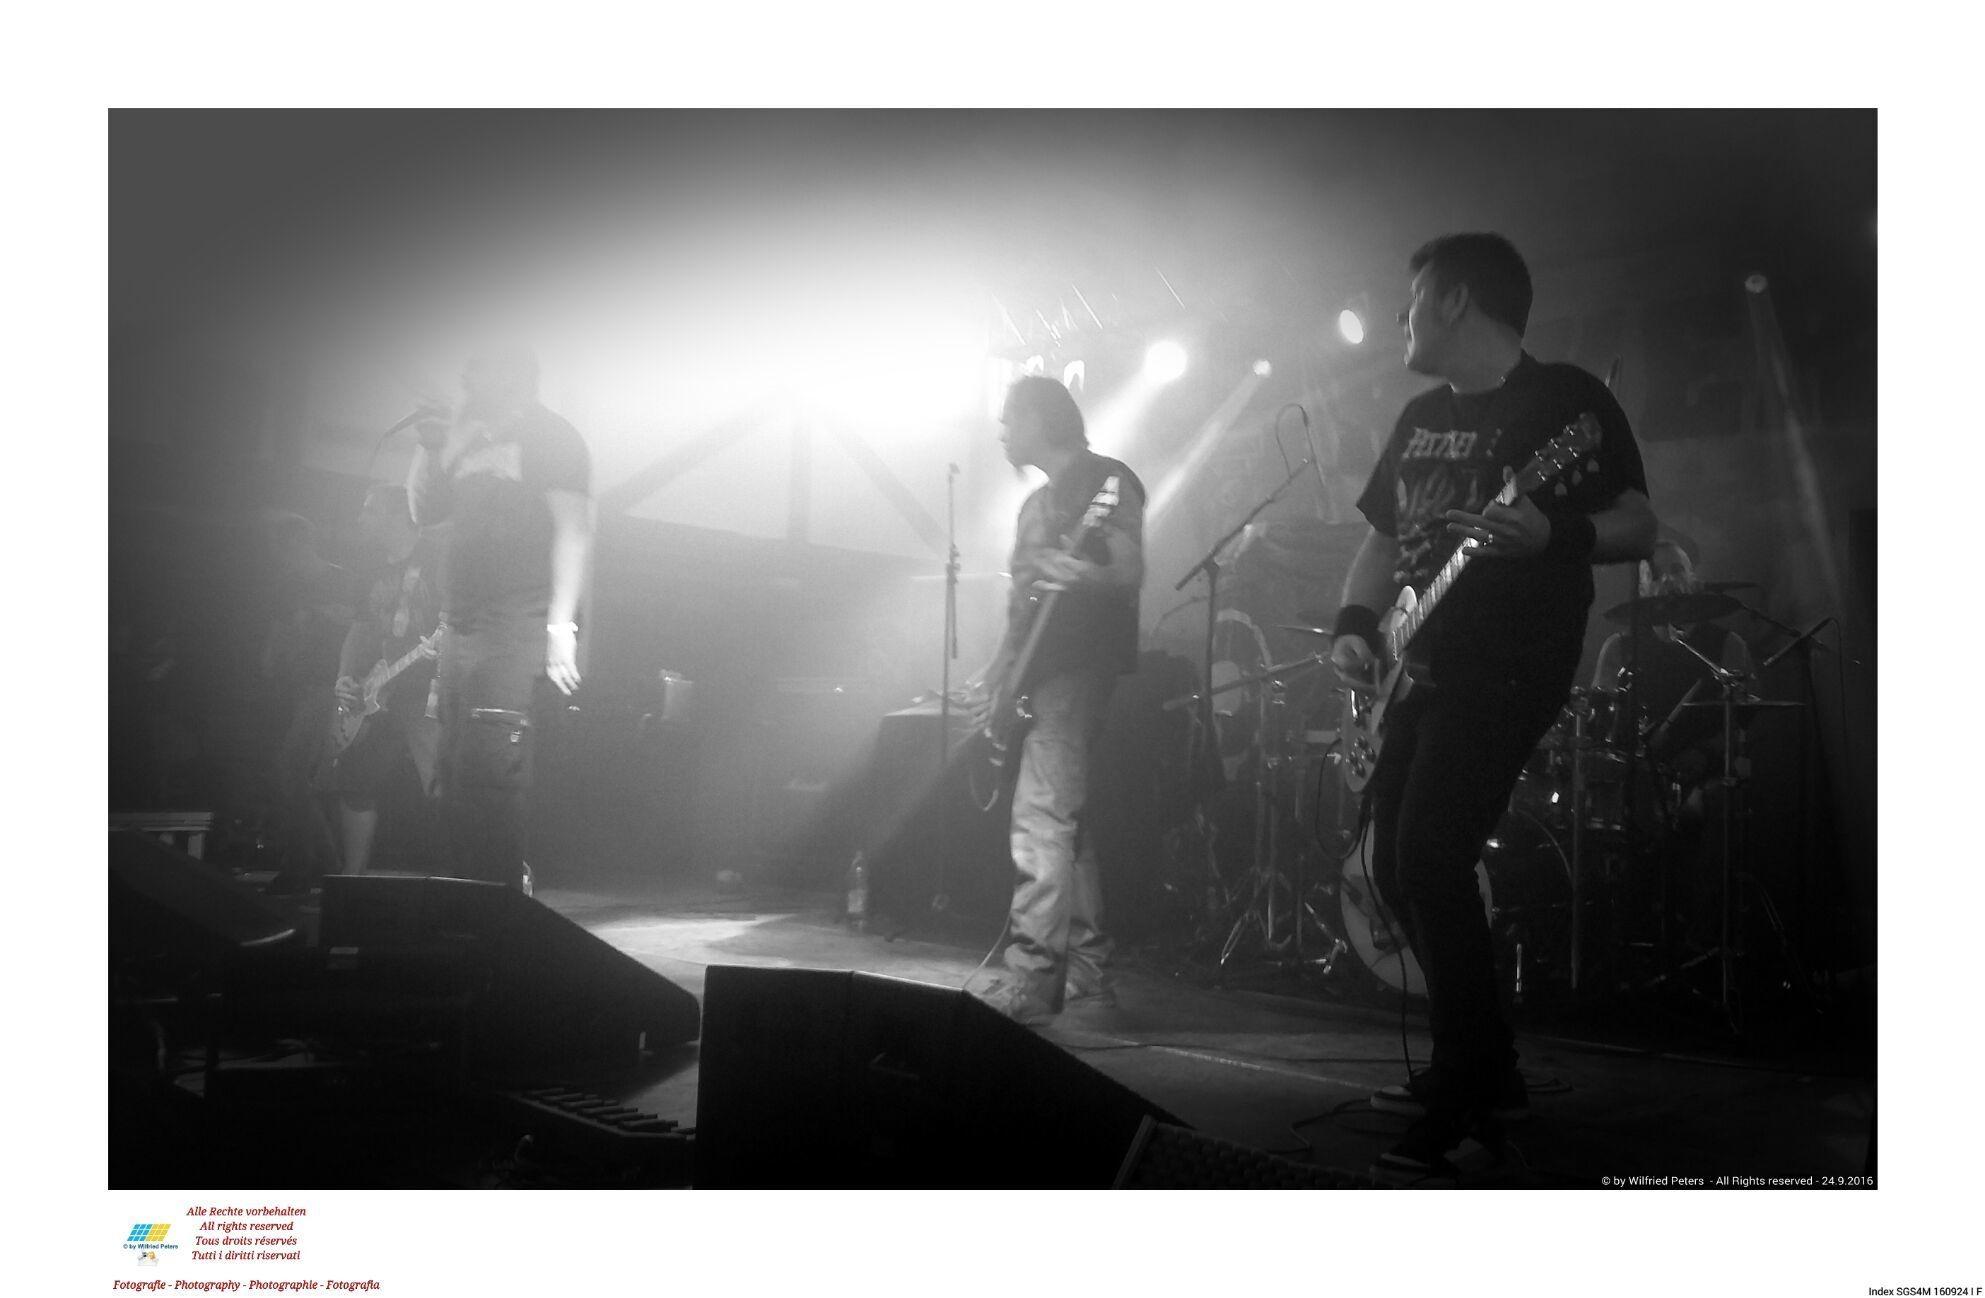 #Fotografie #Photography #Photographie #Fotografia #Musik #Music #Musique #Musica #Bühne #Stage #Scène #Stadio